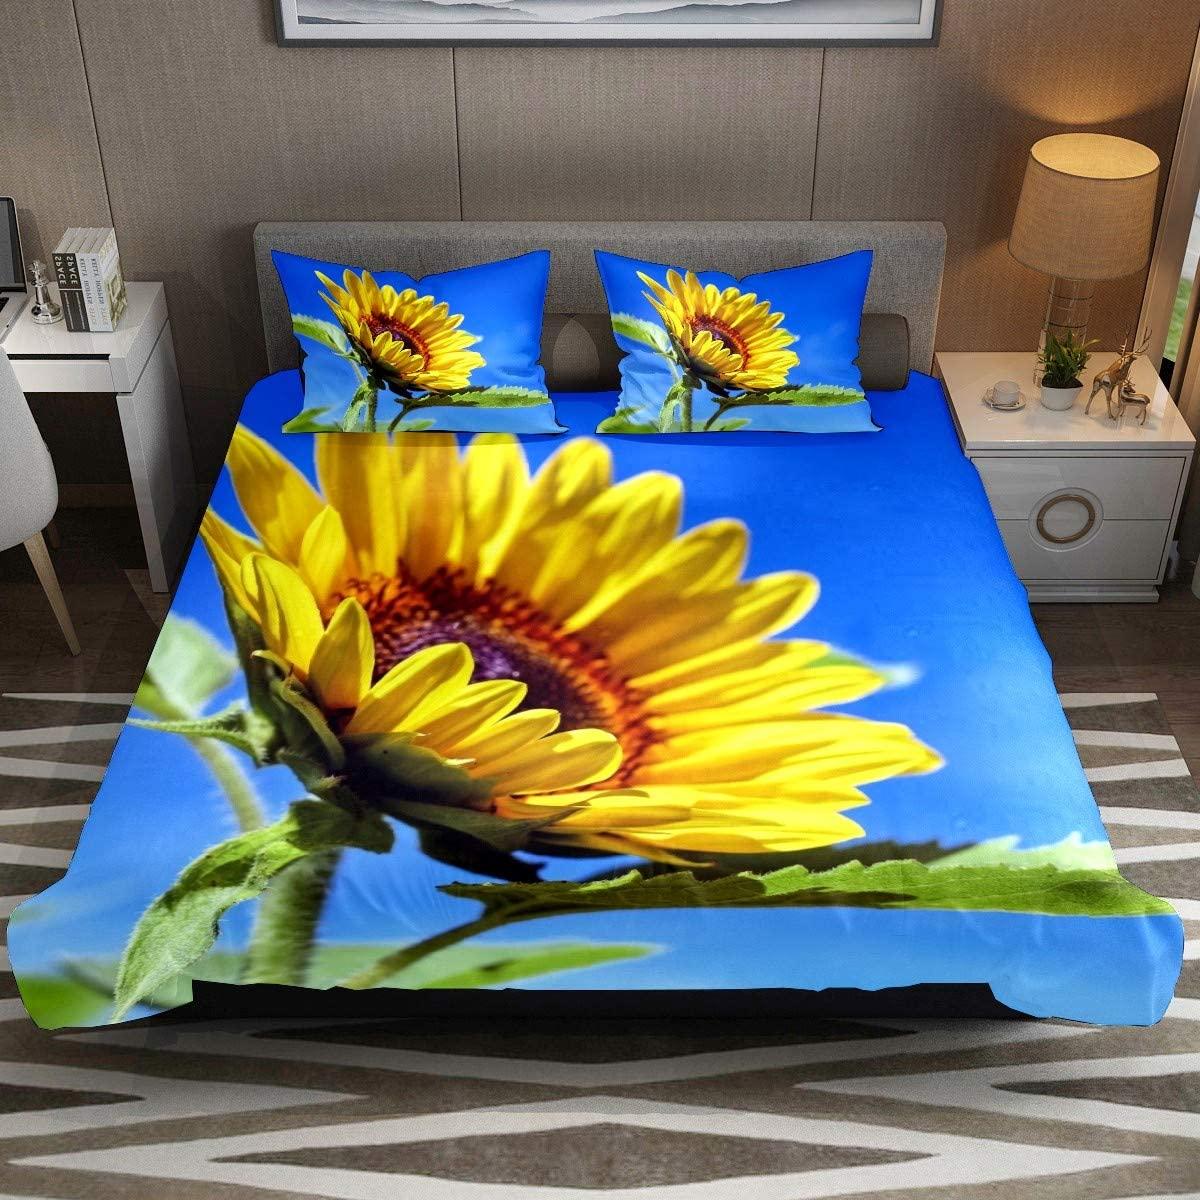 3 Pcs Yellow Sunflower Floral Green Leaves Duvet Cover Set Modern Customize 79 x 90 Breathable Bedding Sets (Full Size) Home Decor for Kids Children Teens Boys Girls